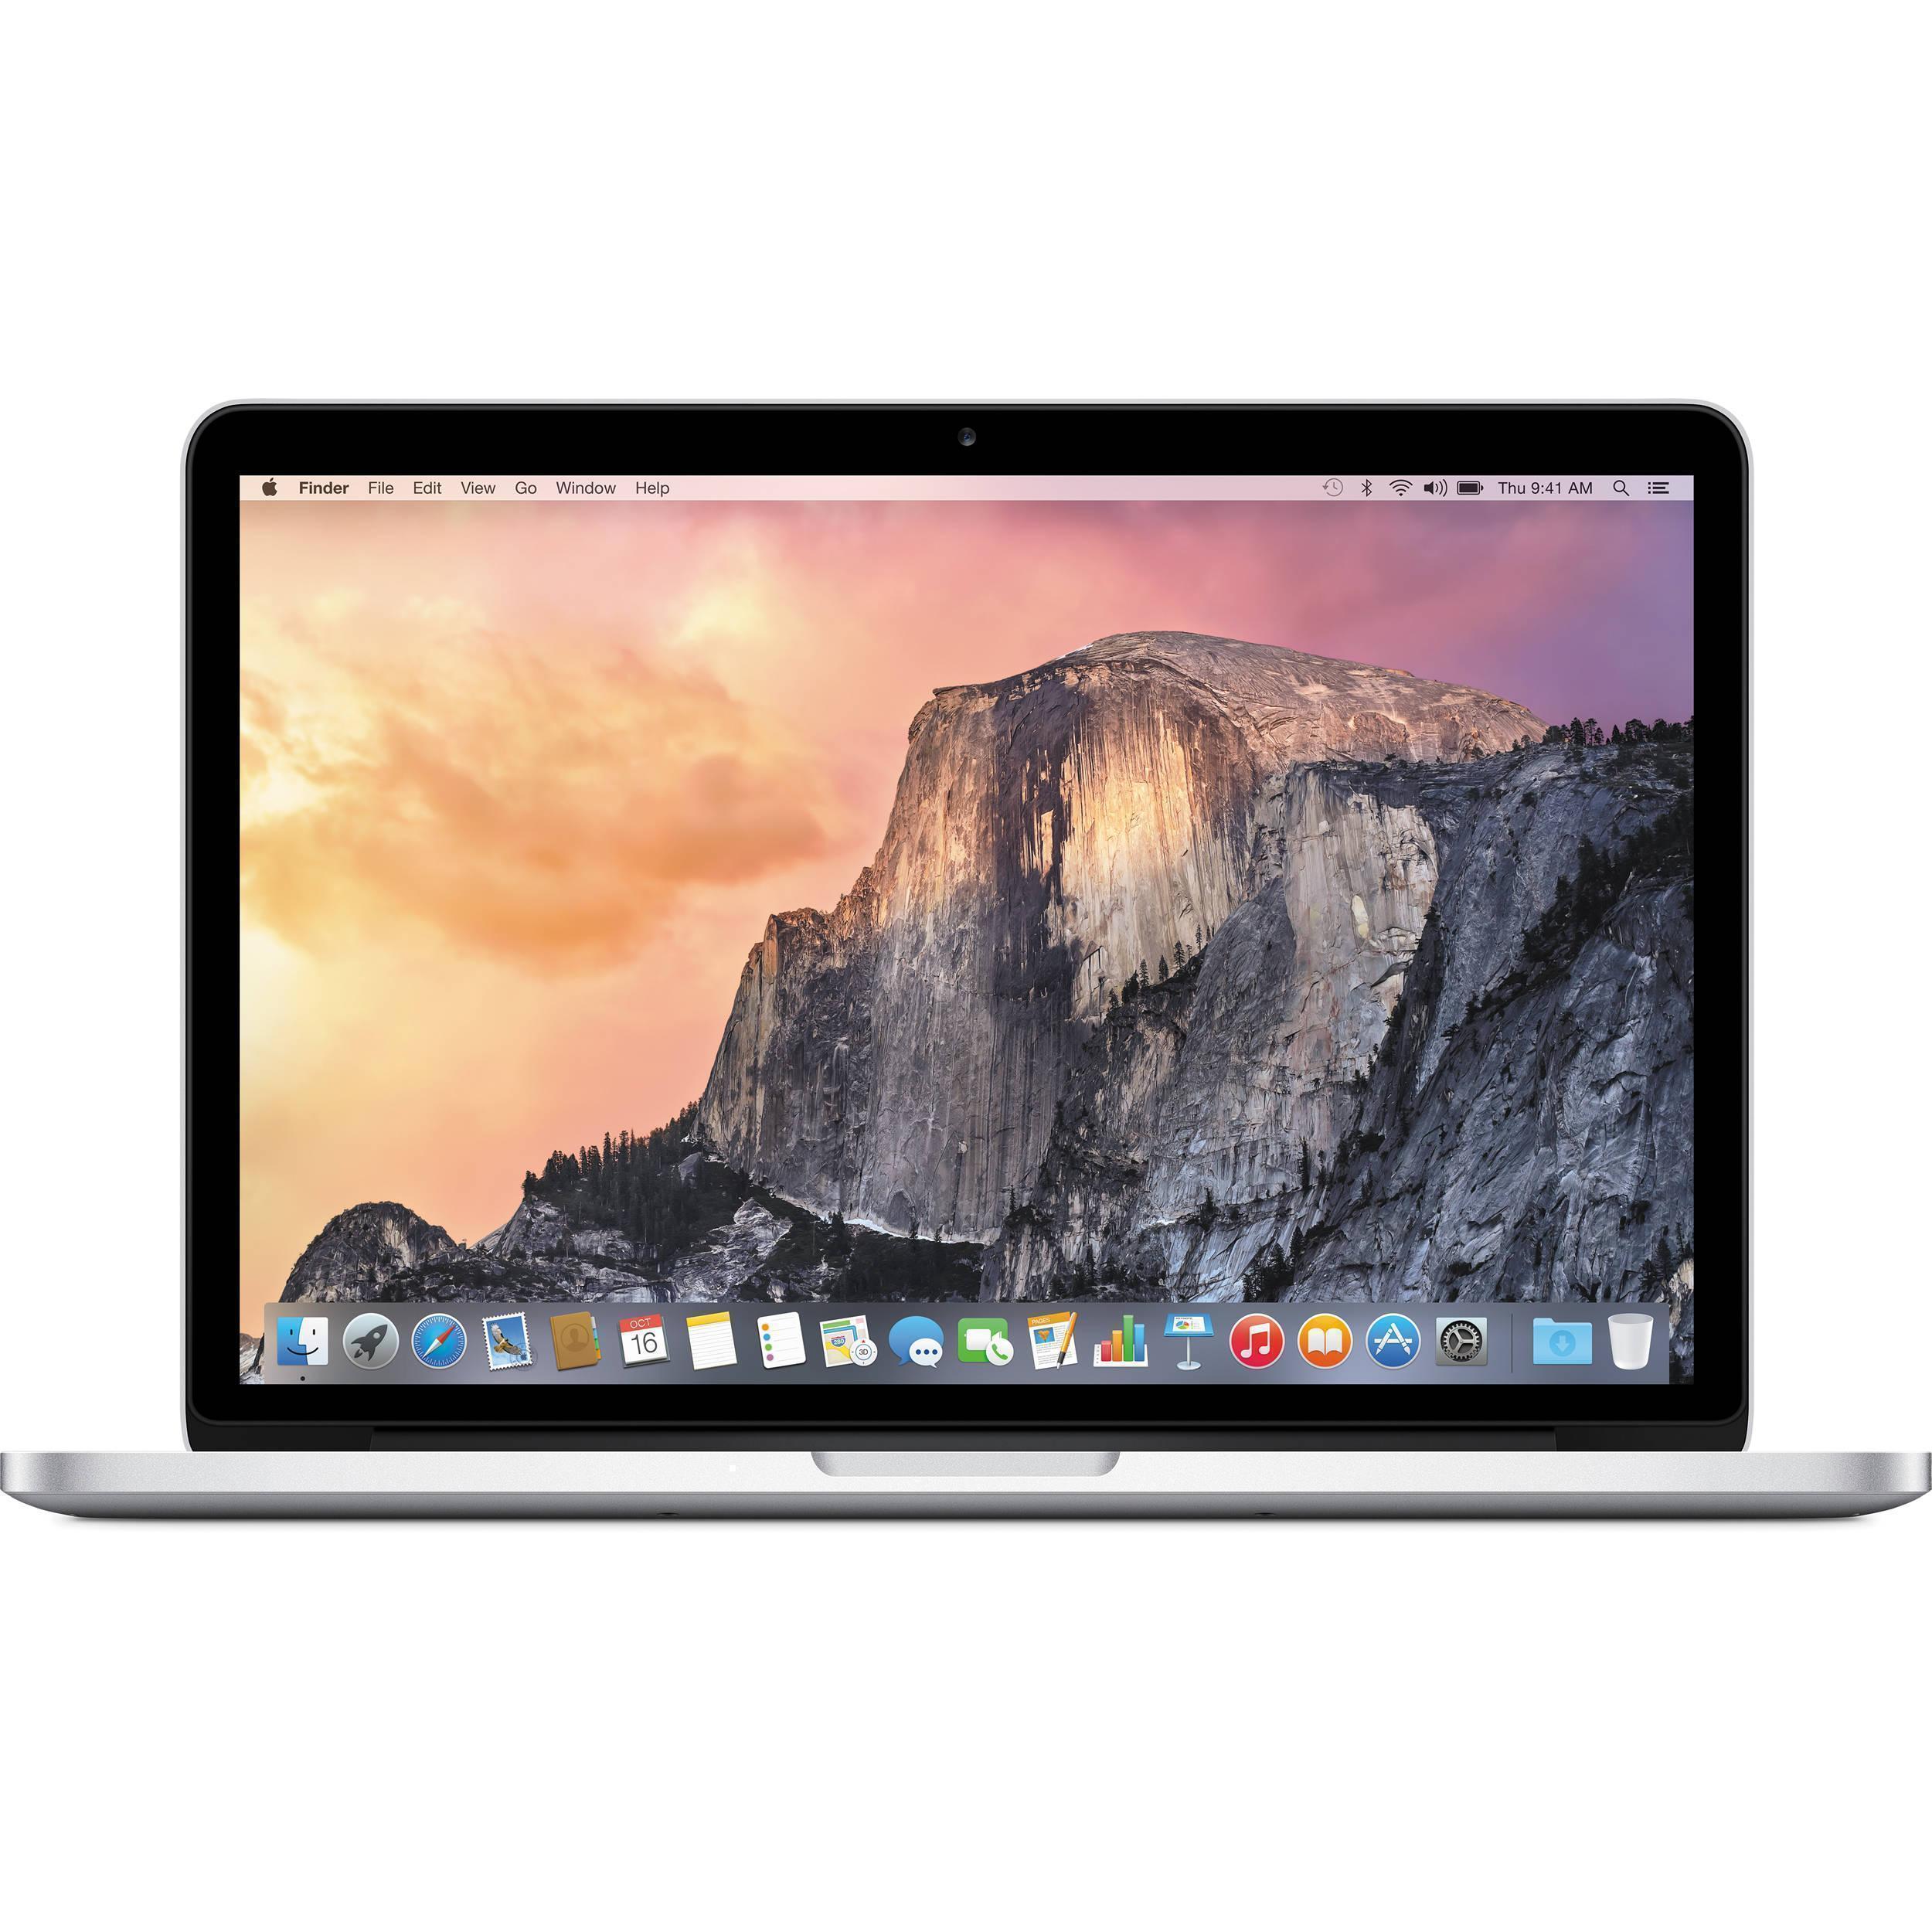 "MacBook Pro Retina 13"" (2015) - Core i5 - 16GB - SSD 256 Gb QWERTY - Αγγλικά (US)"